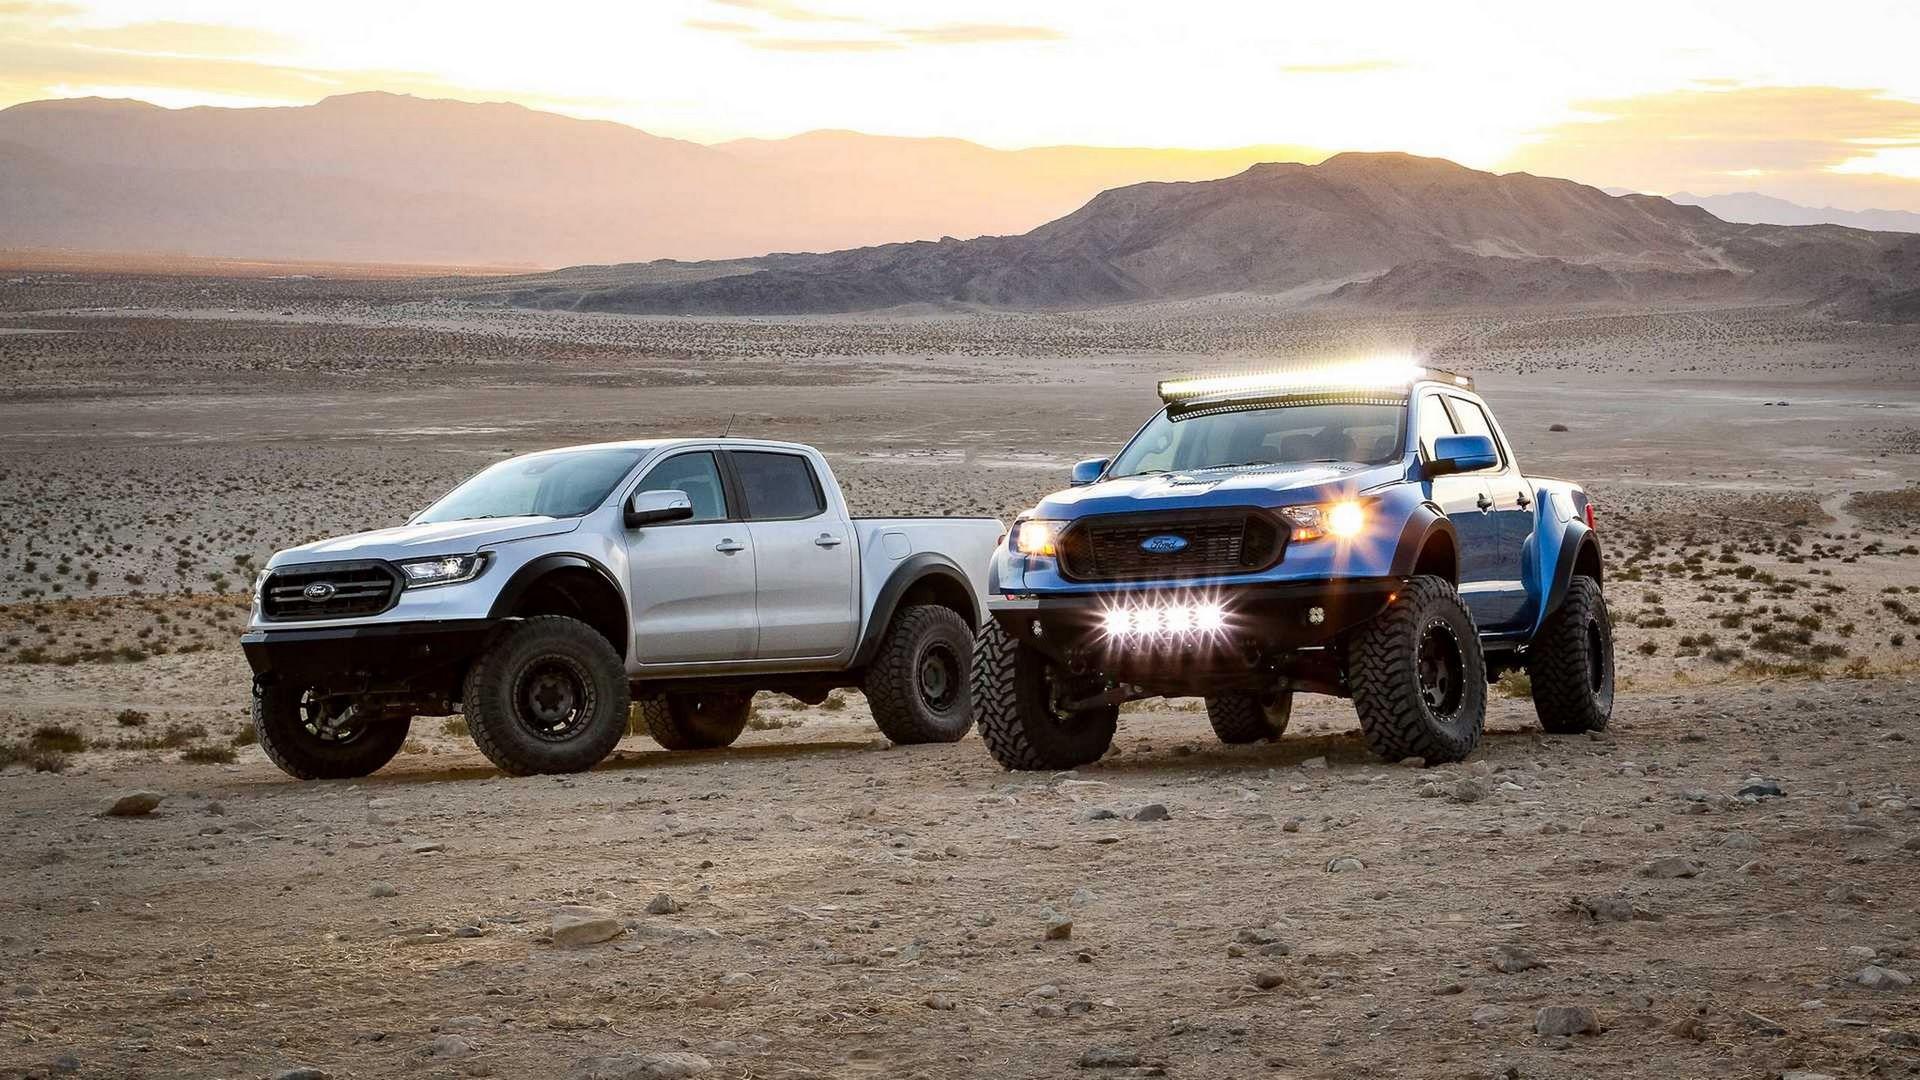 Ford-Ranger-Prorunner-By-APG-23